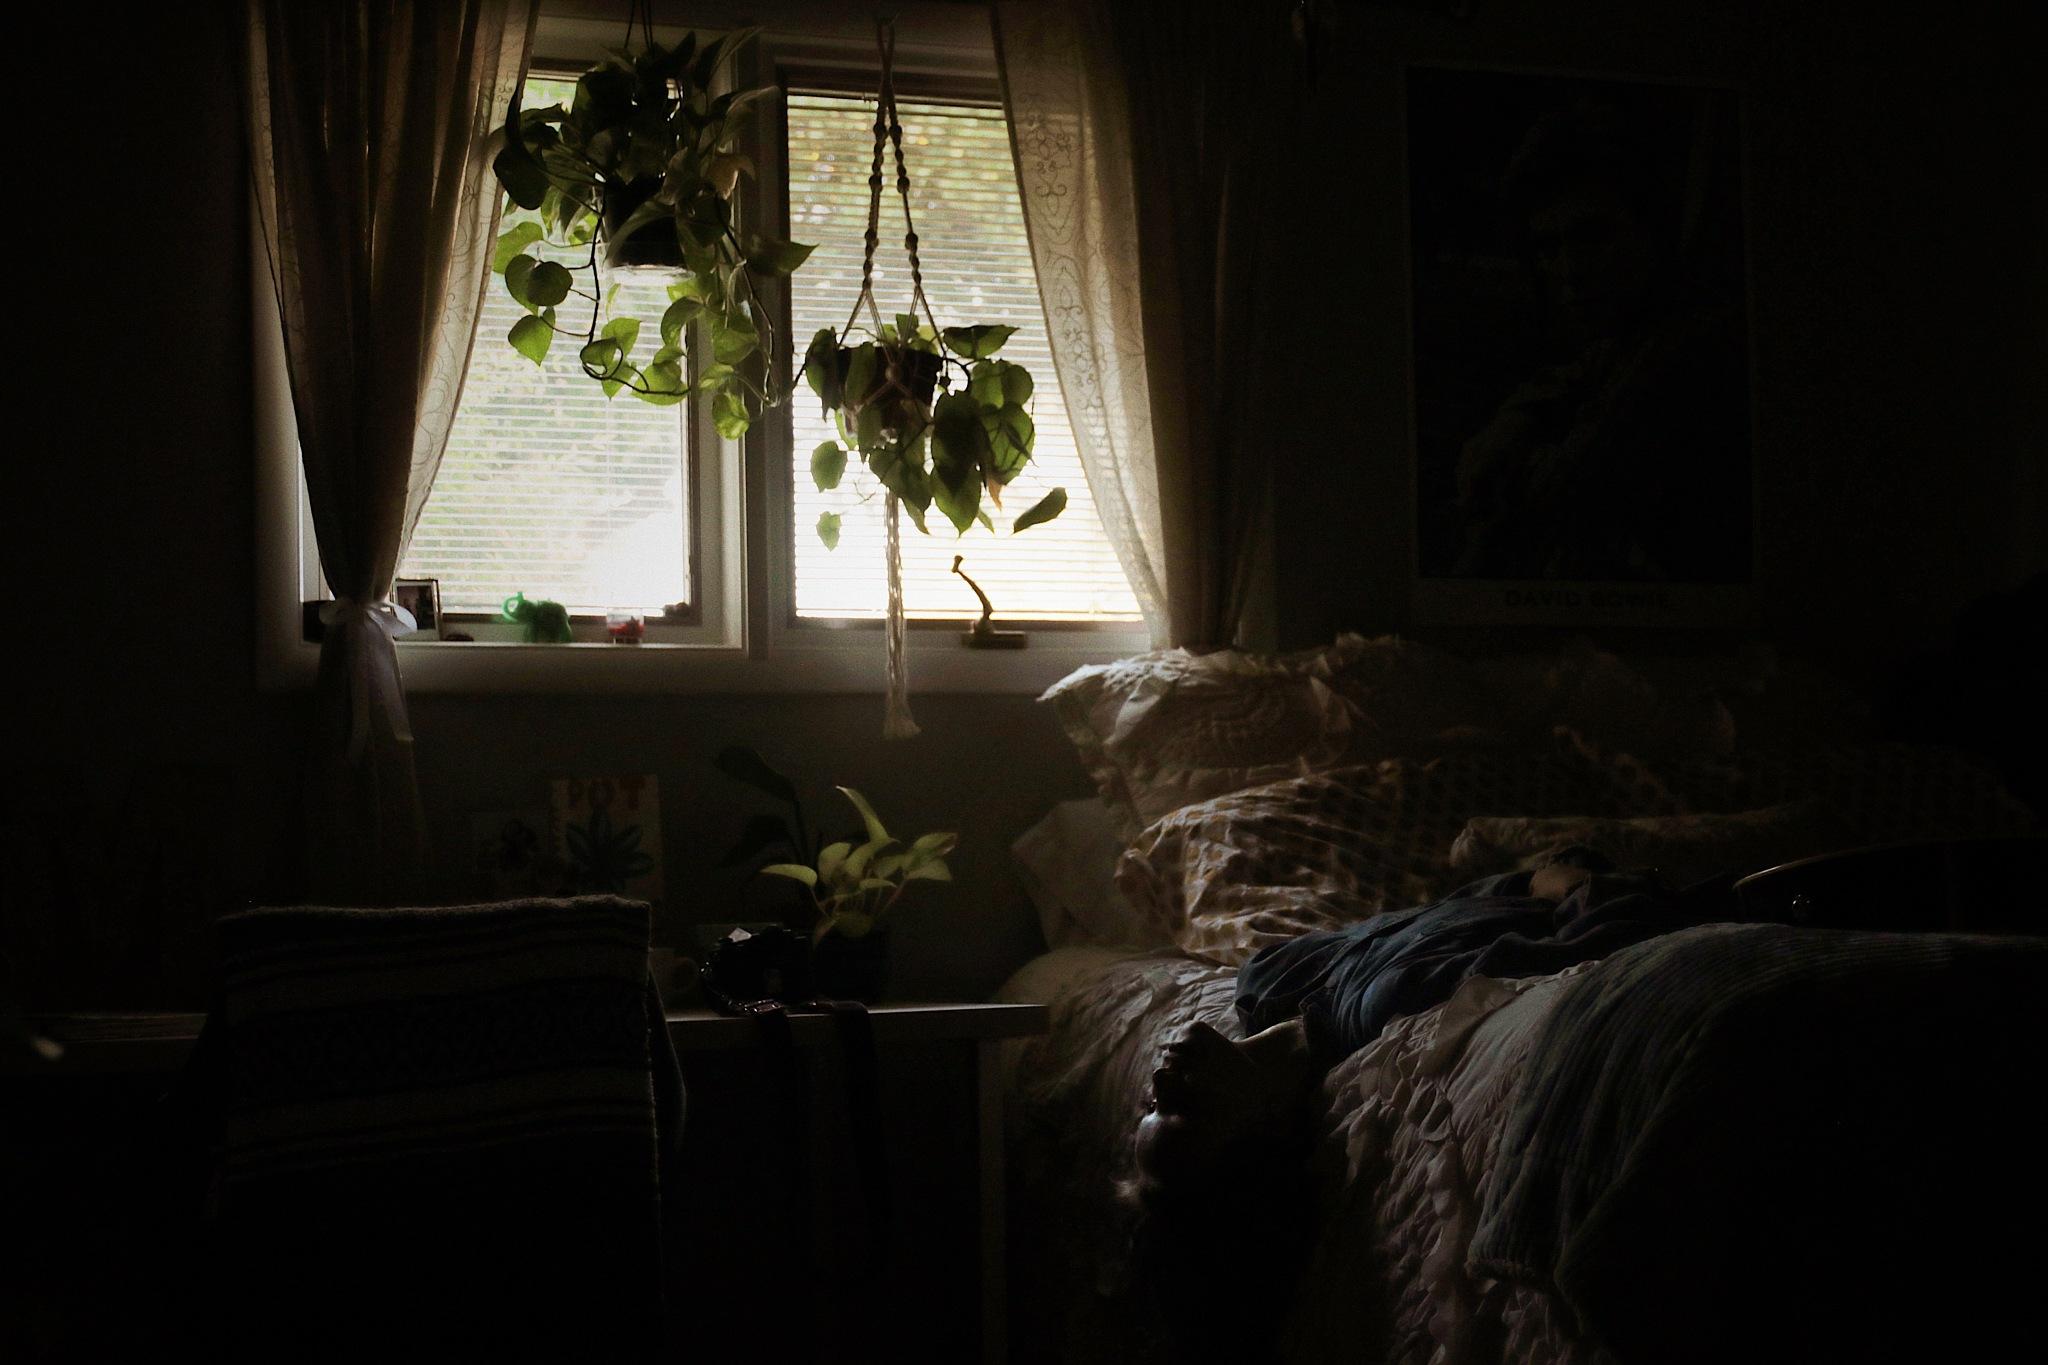 Mallie Pierson by Tom J. McCoy